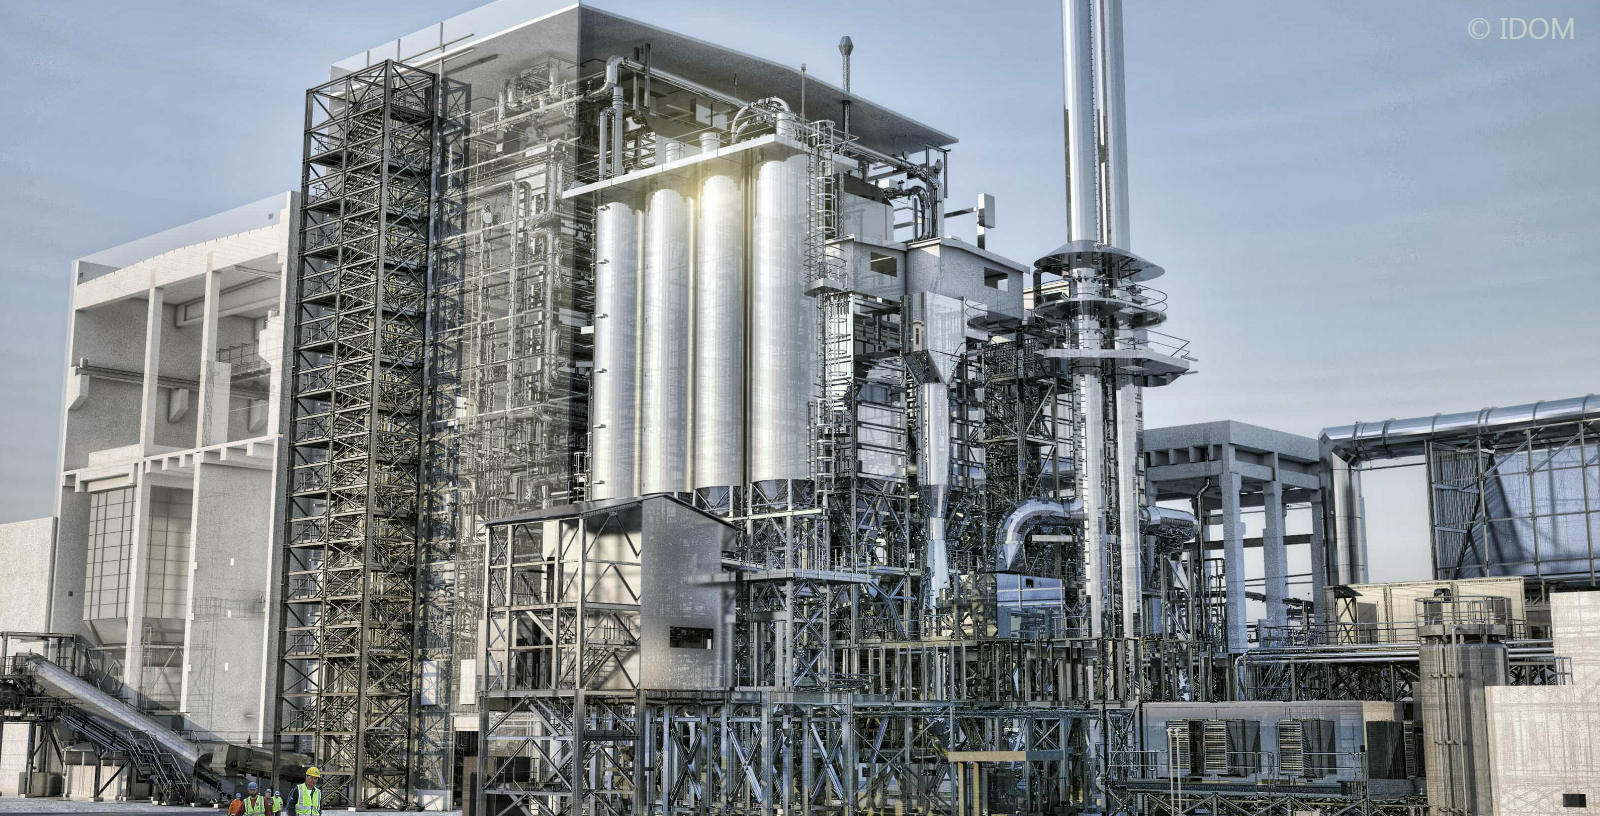 HITACHI_WTE_Waste To Energy_Plants_Incinerators_Dublin_Poznan_Buckinghamshire_Severnside_Hartlebury_IDOM_1